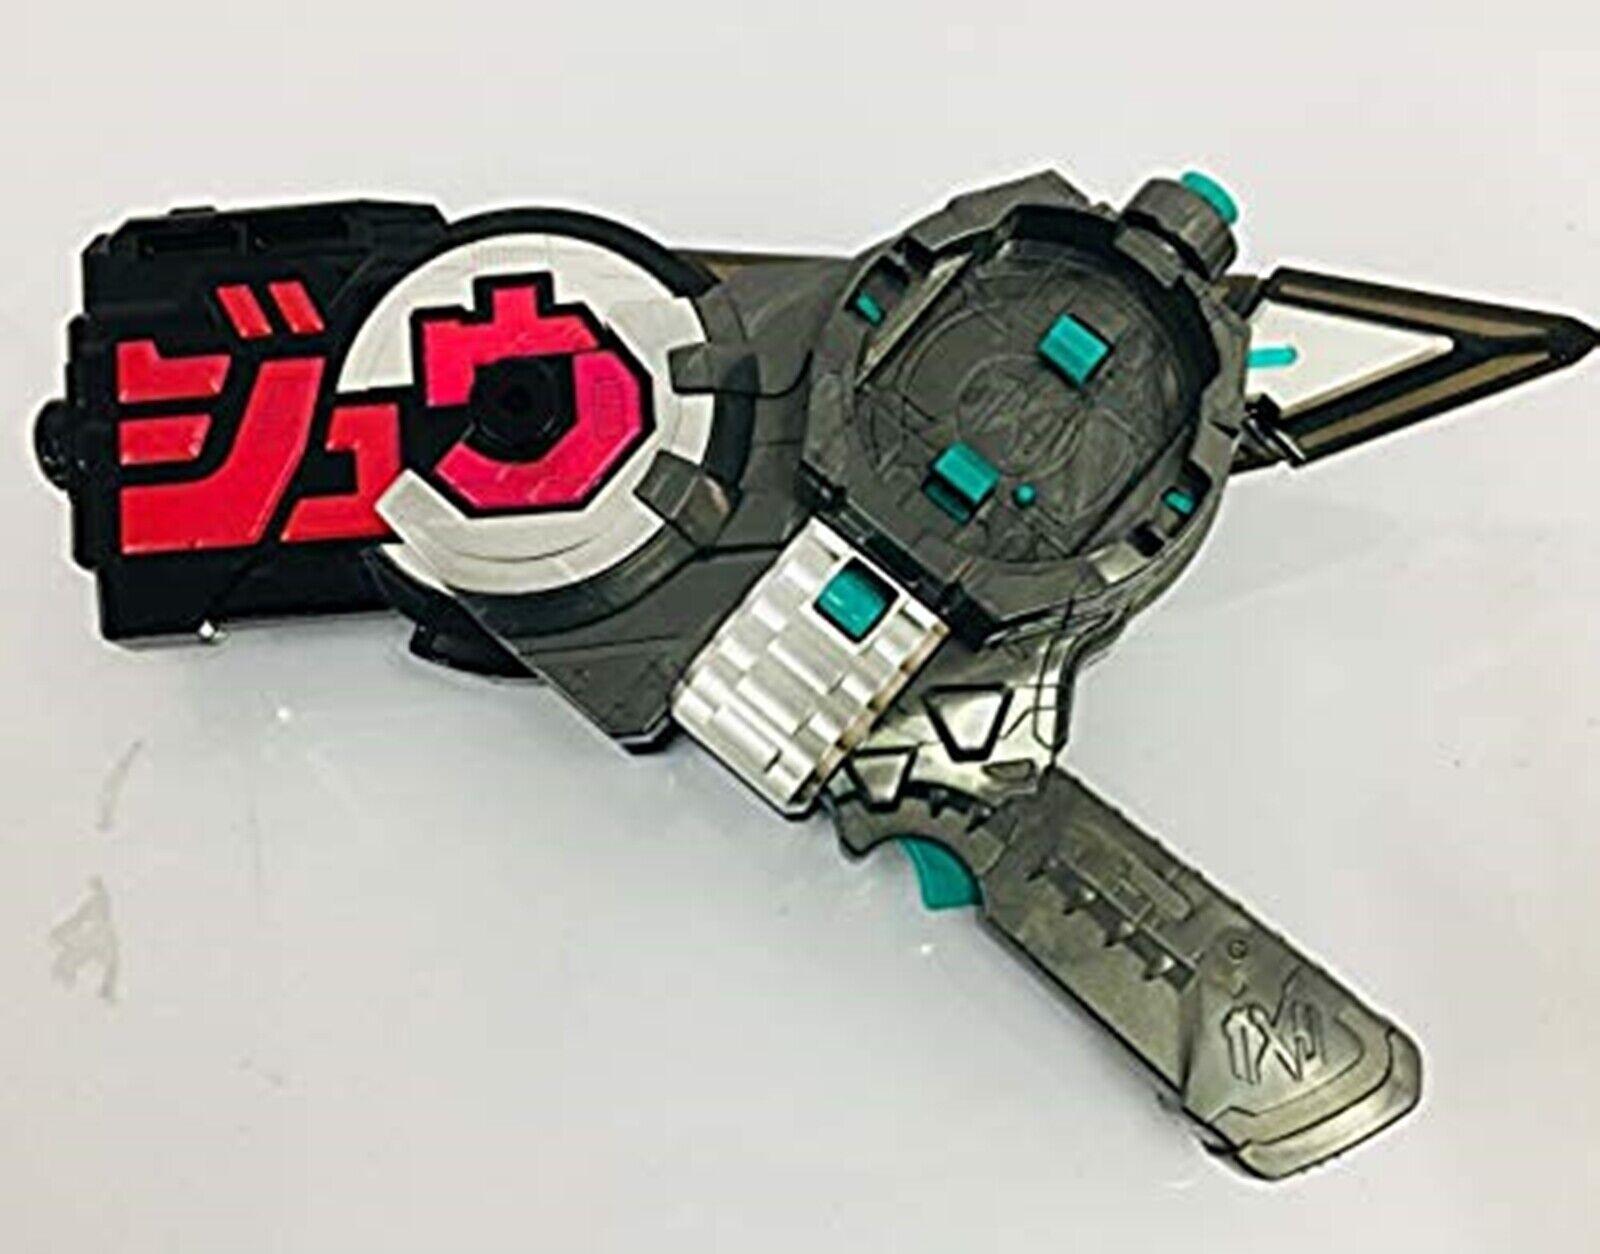 Toys' R Us Limited Kamen Rider Zi-O Zi-O Zi-O DX Ziku Driver Special SET JAPAN IMPORT USED 909f3d